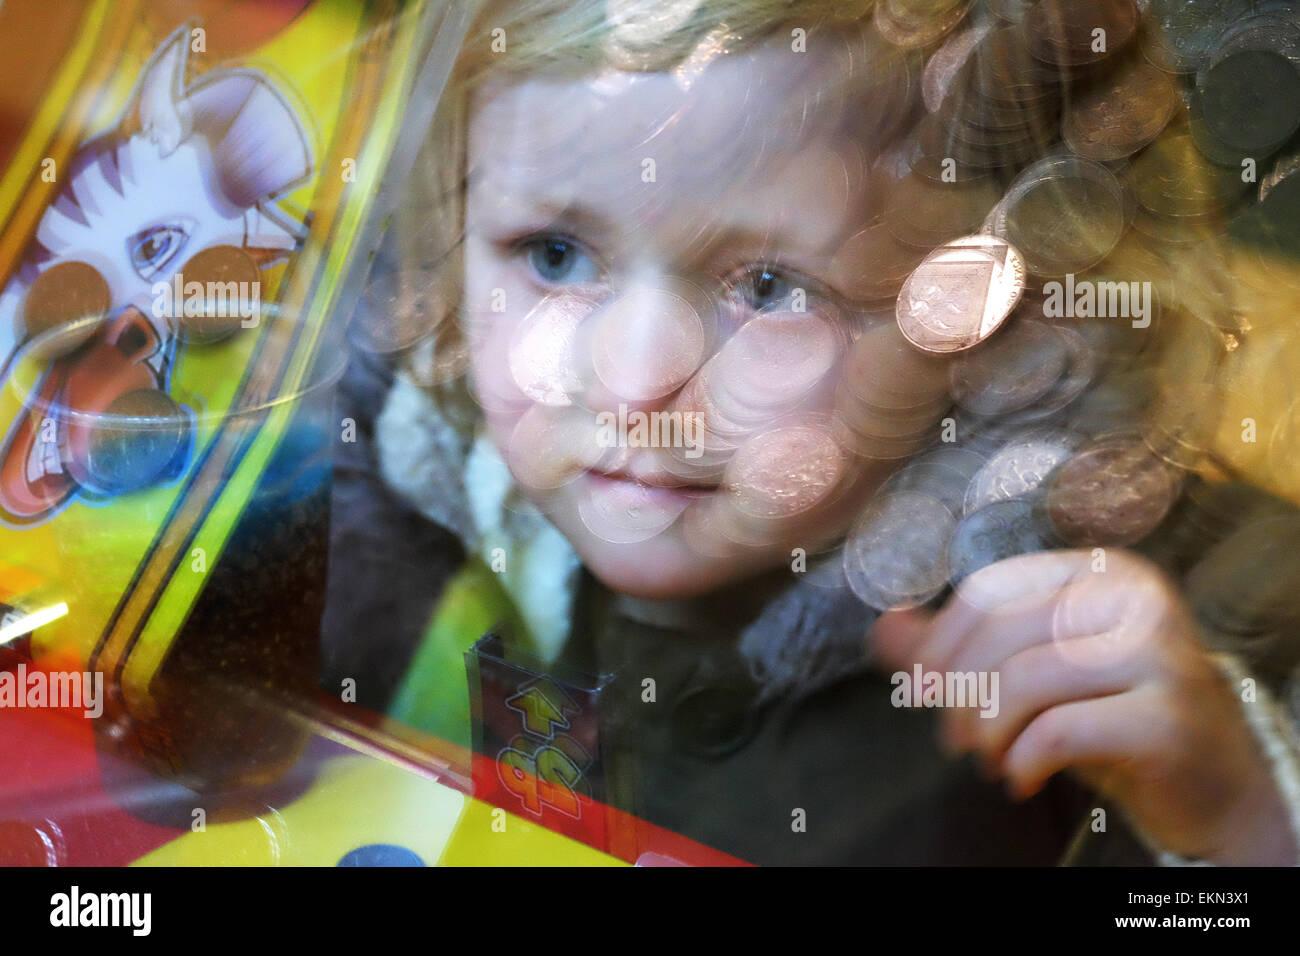 Small girl with amusement arcade machine. - Stock Image